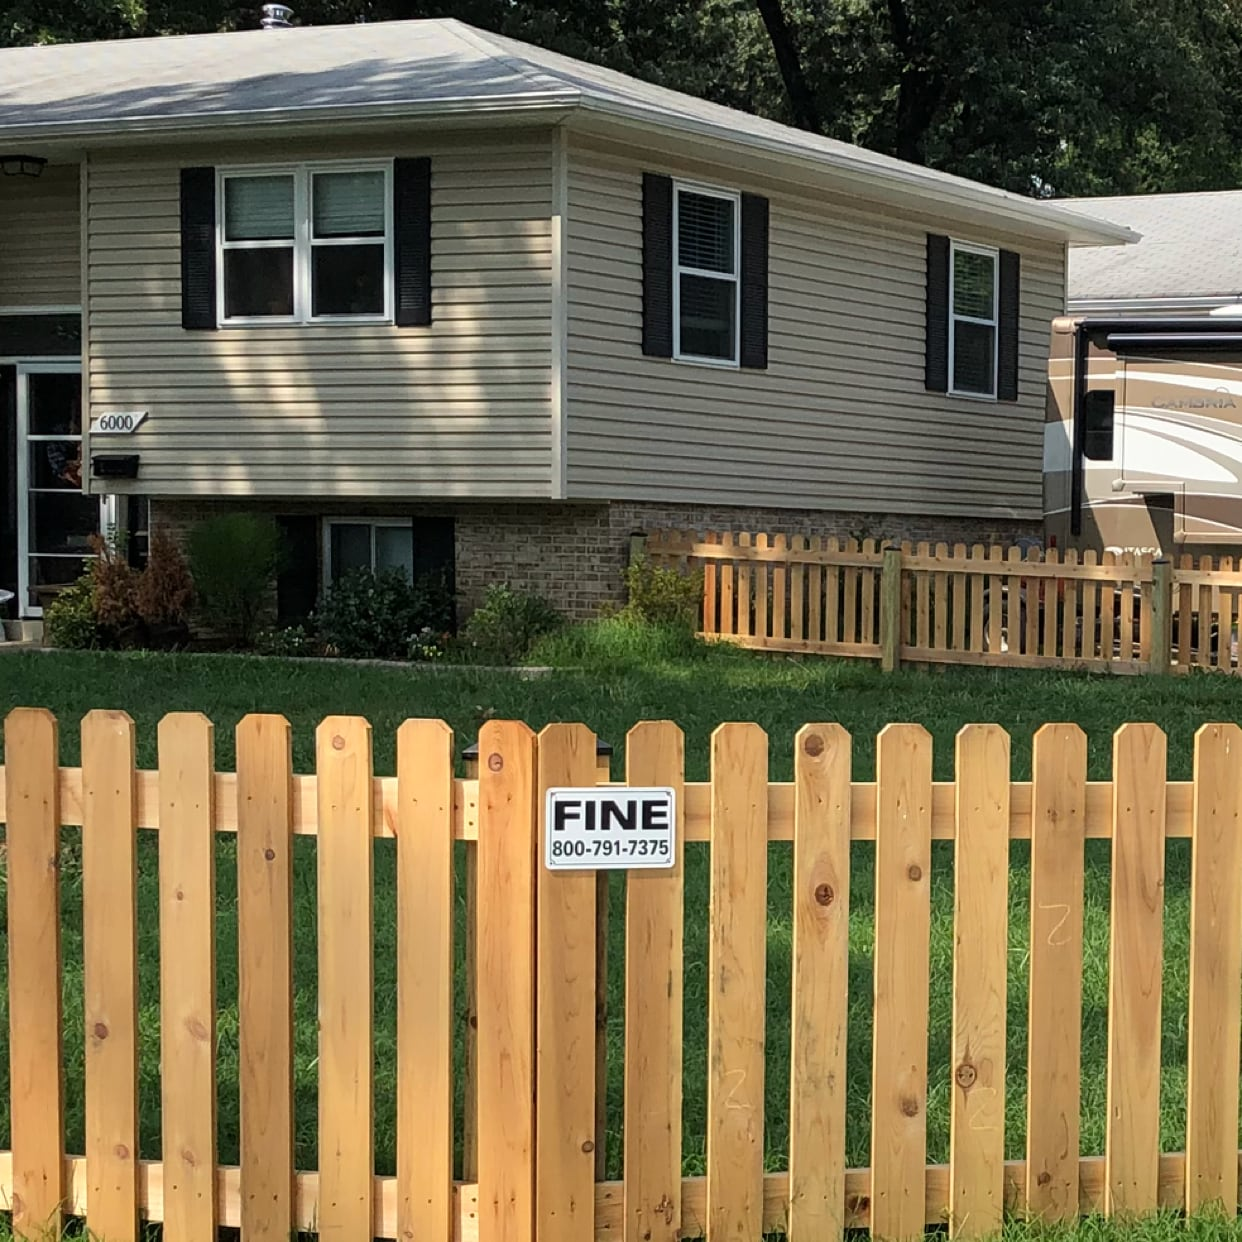 FINE Fence